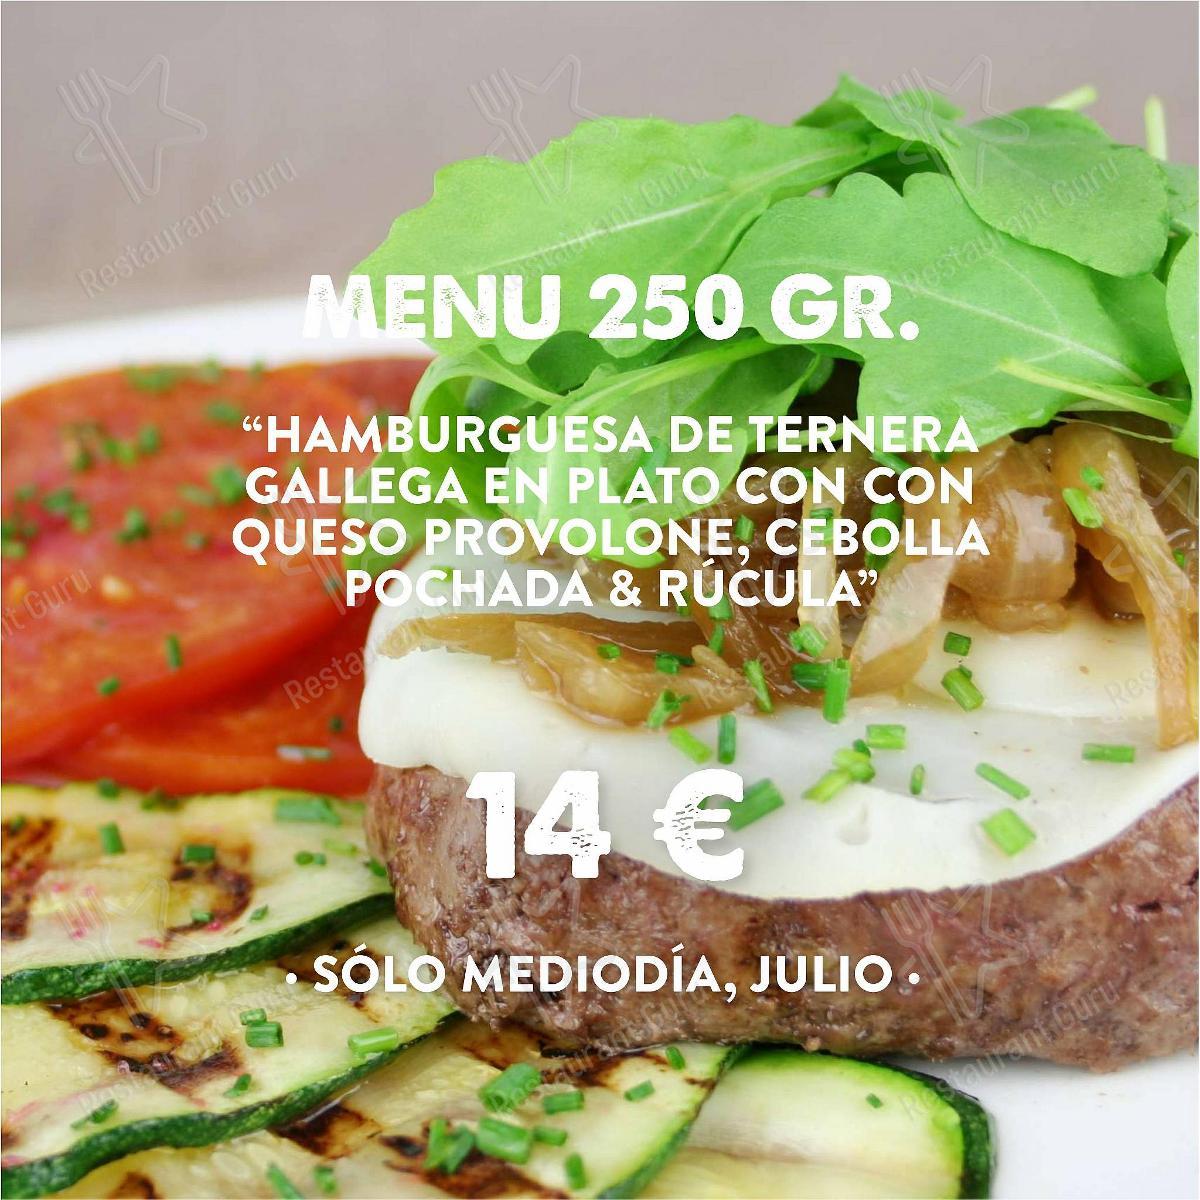 Menu for the Hamburguesería Jalos restaurant